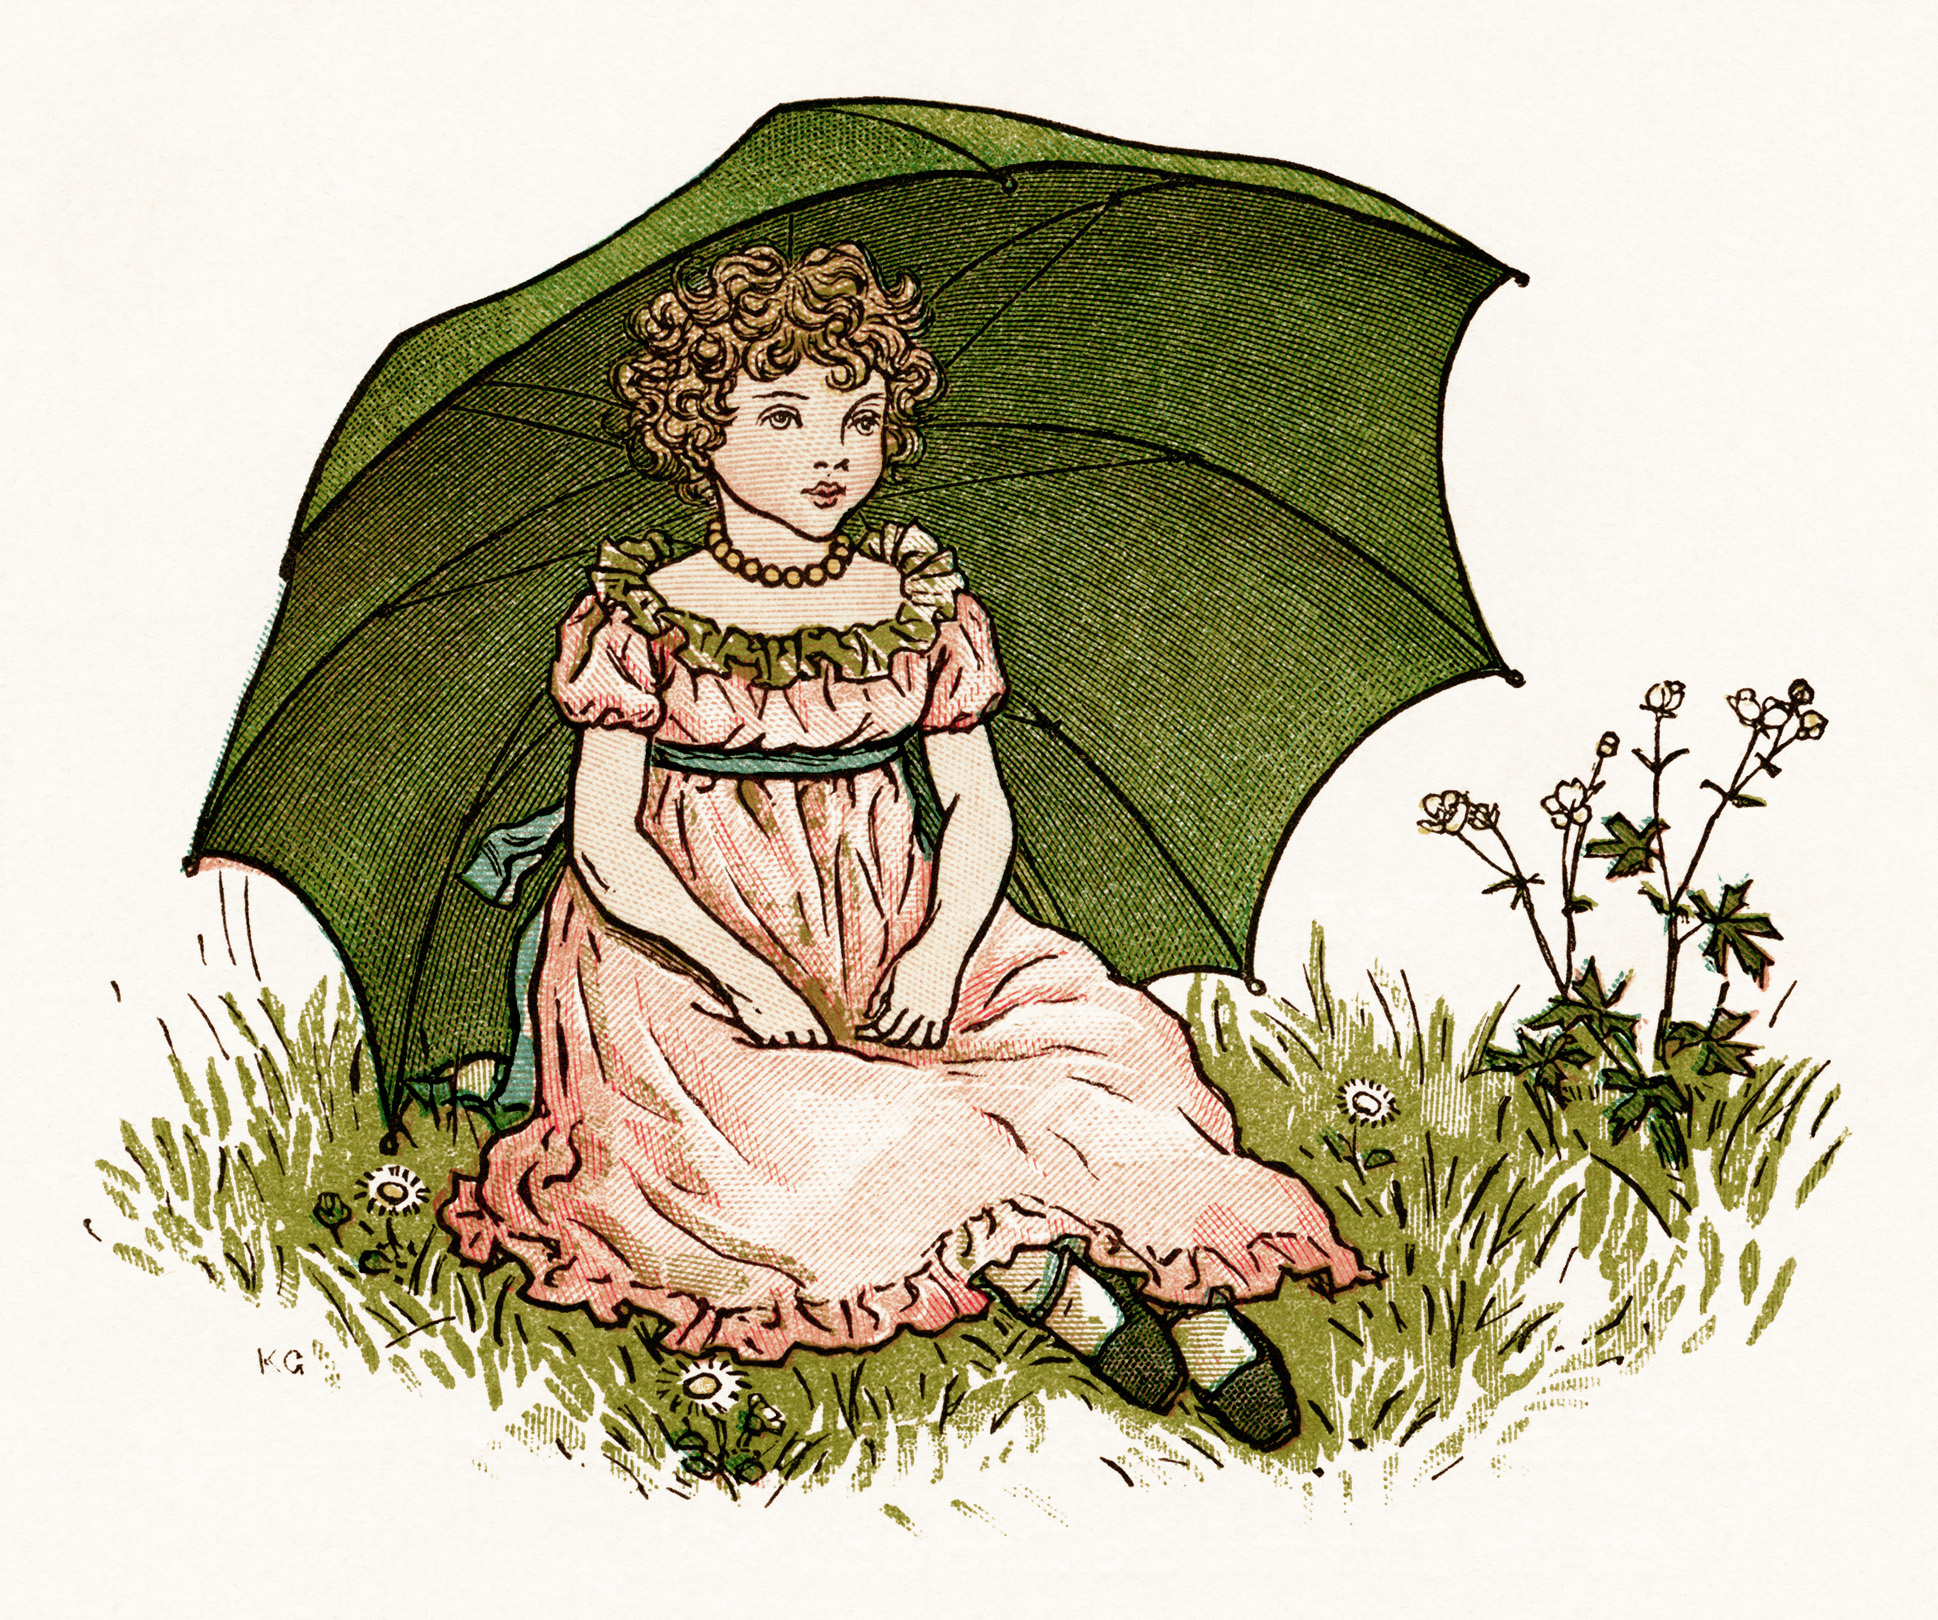 Kate Greenaway, Marigold Garden, little London girl, girl sitting on grass, Victorian girl, girl green umbrella, vintage storybook image